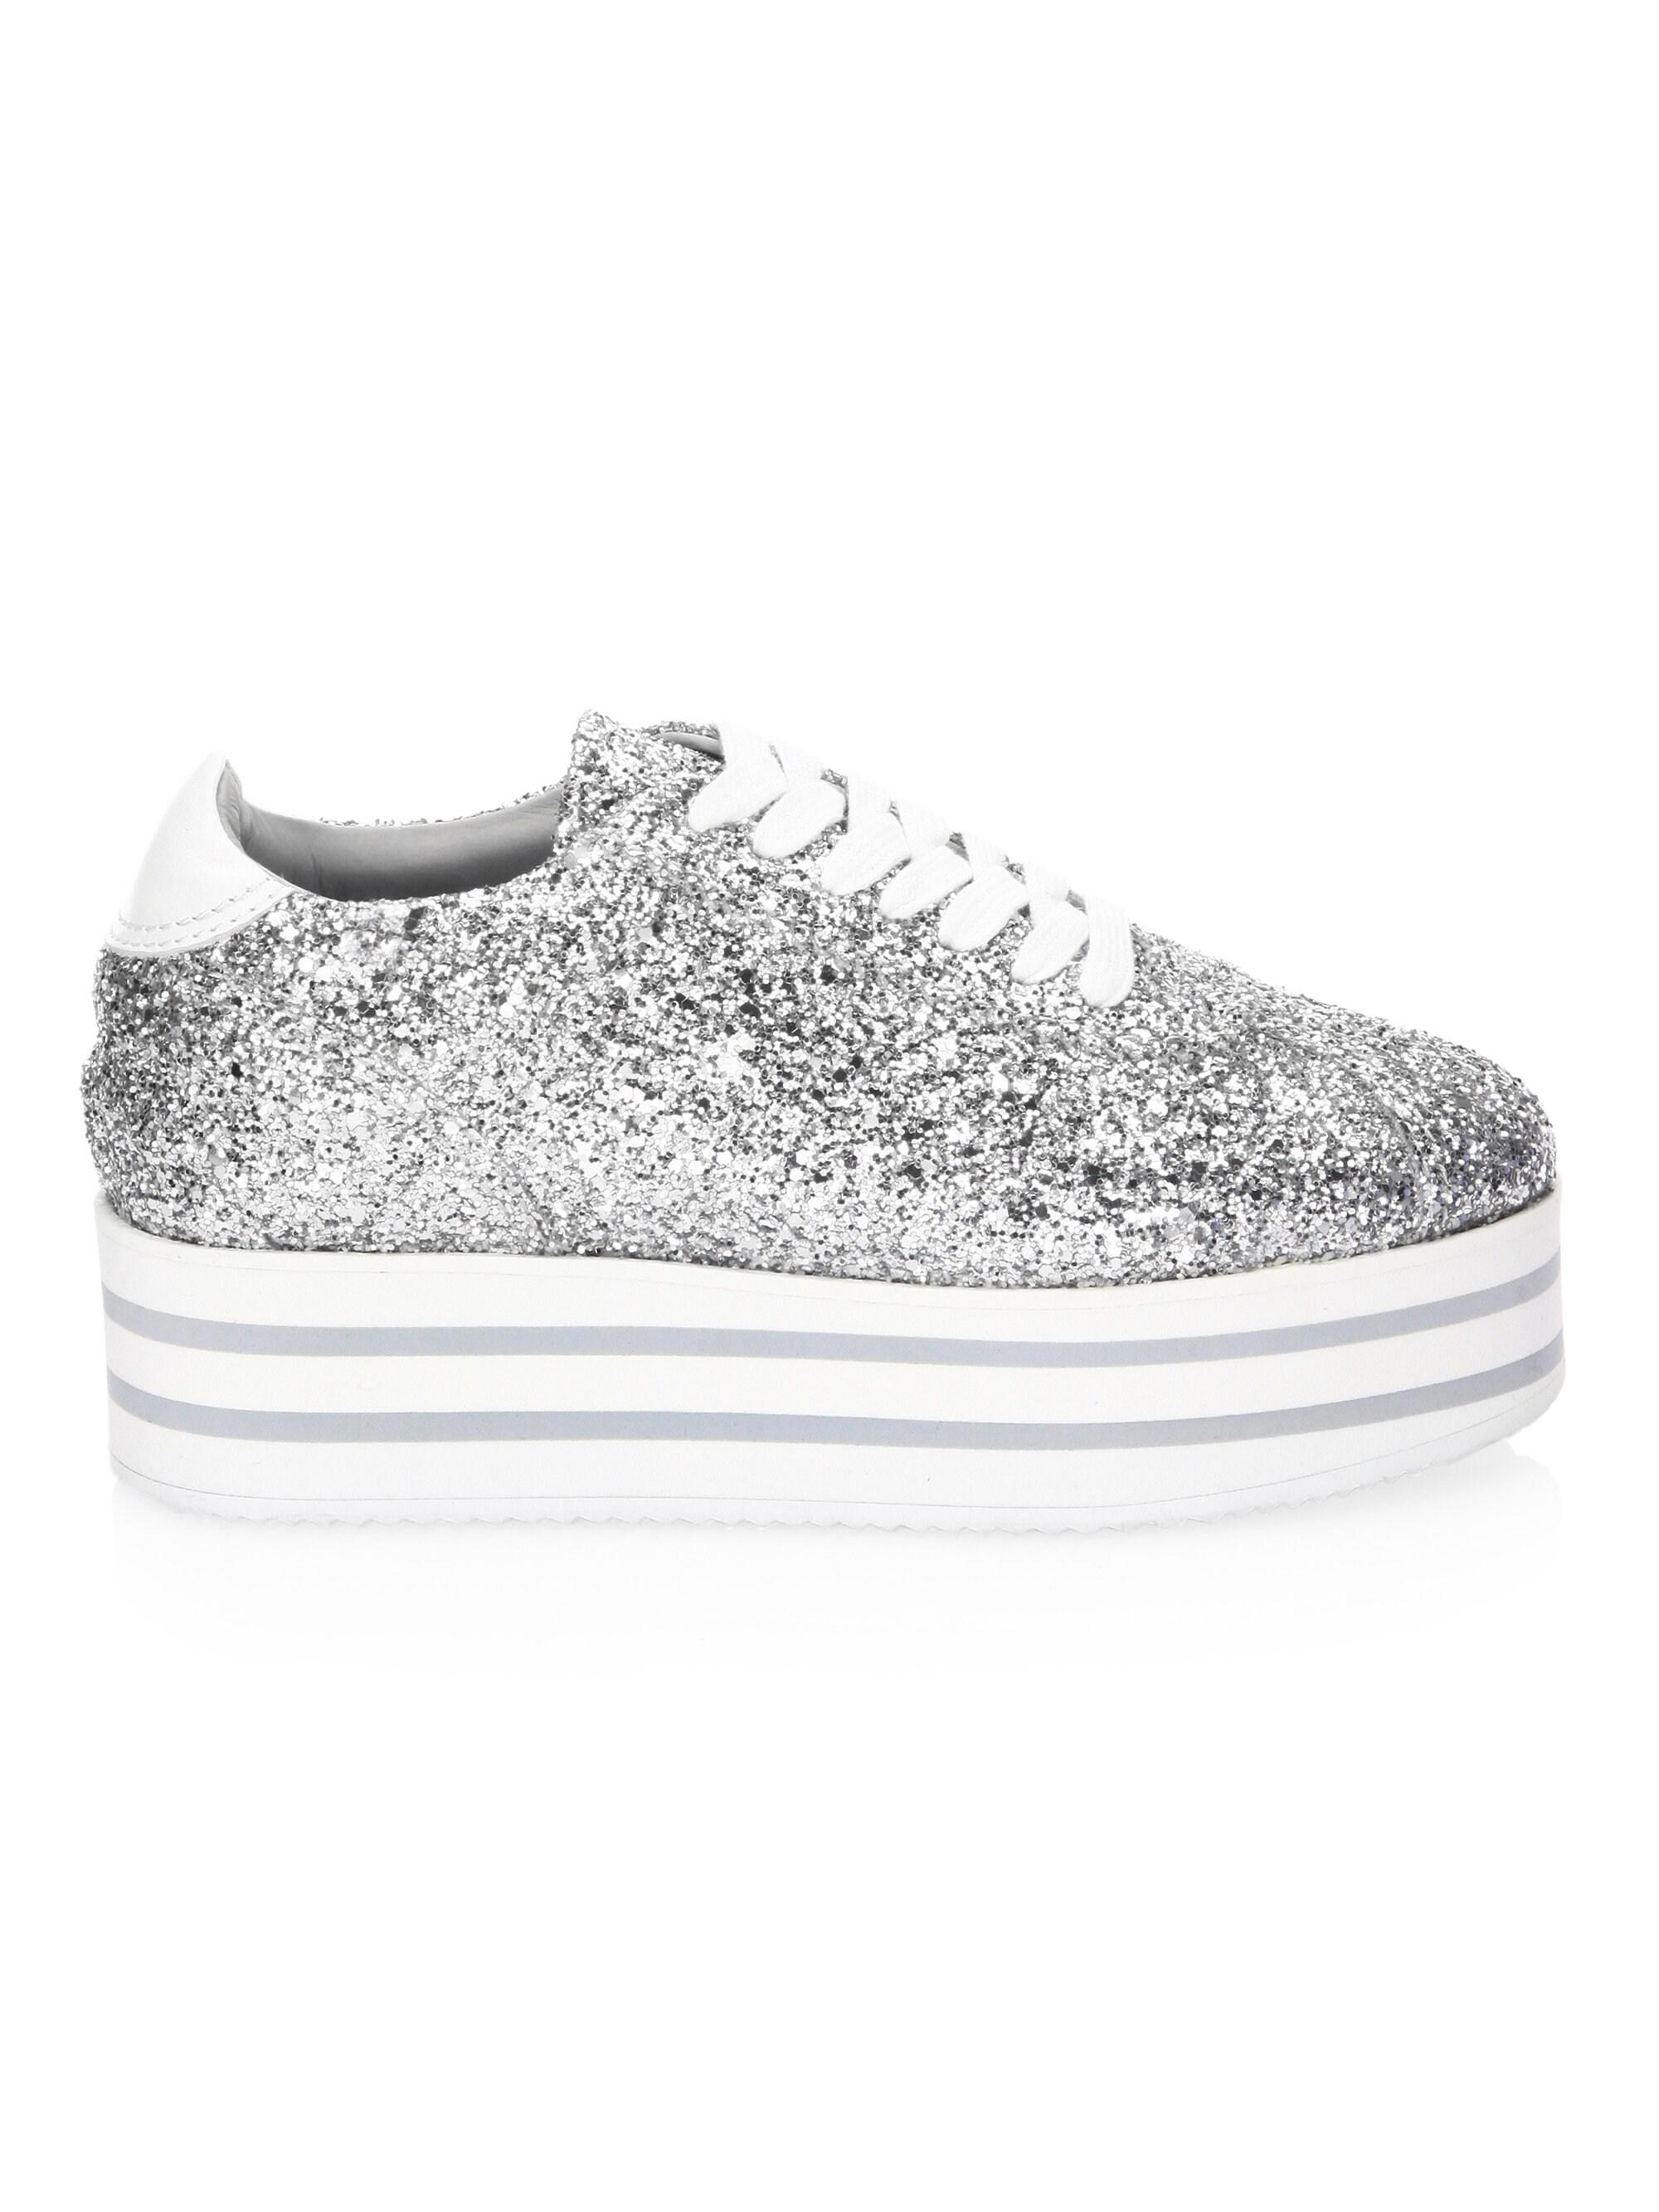 fc8b6e389ab Lyst - Chiara Ferragni Glitter Platform Sneaker in Metallic